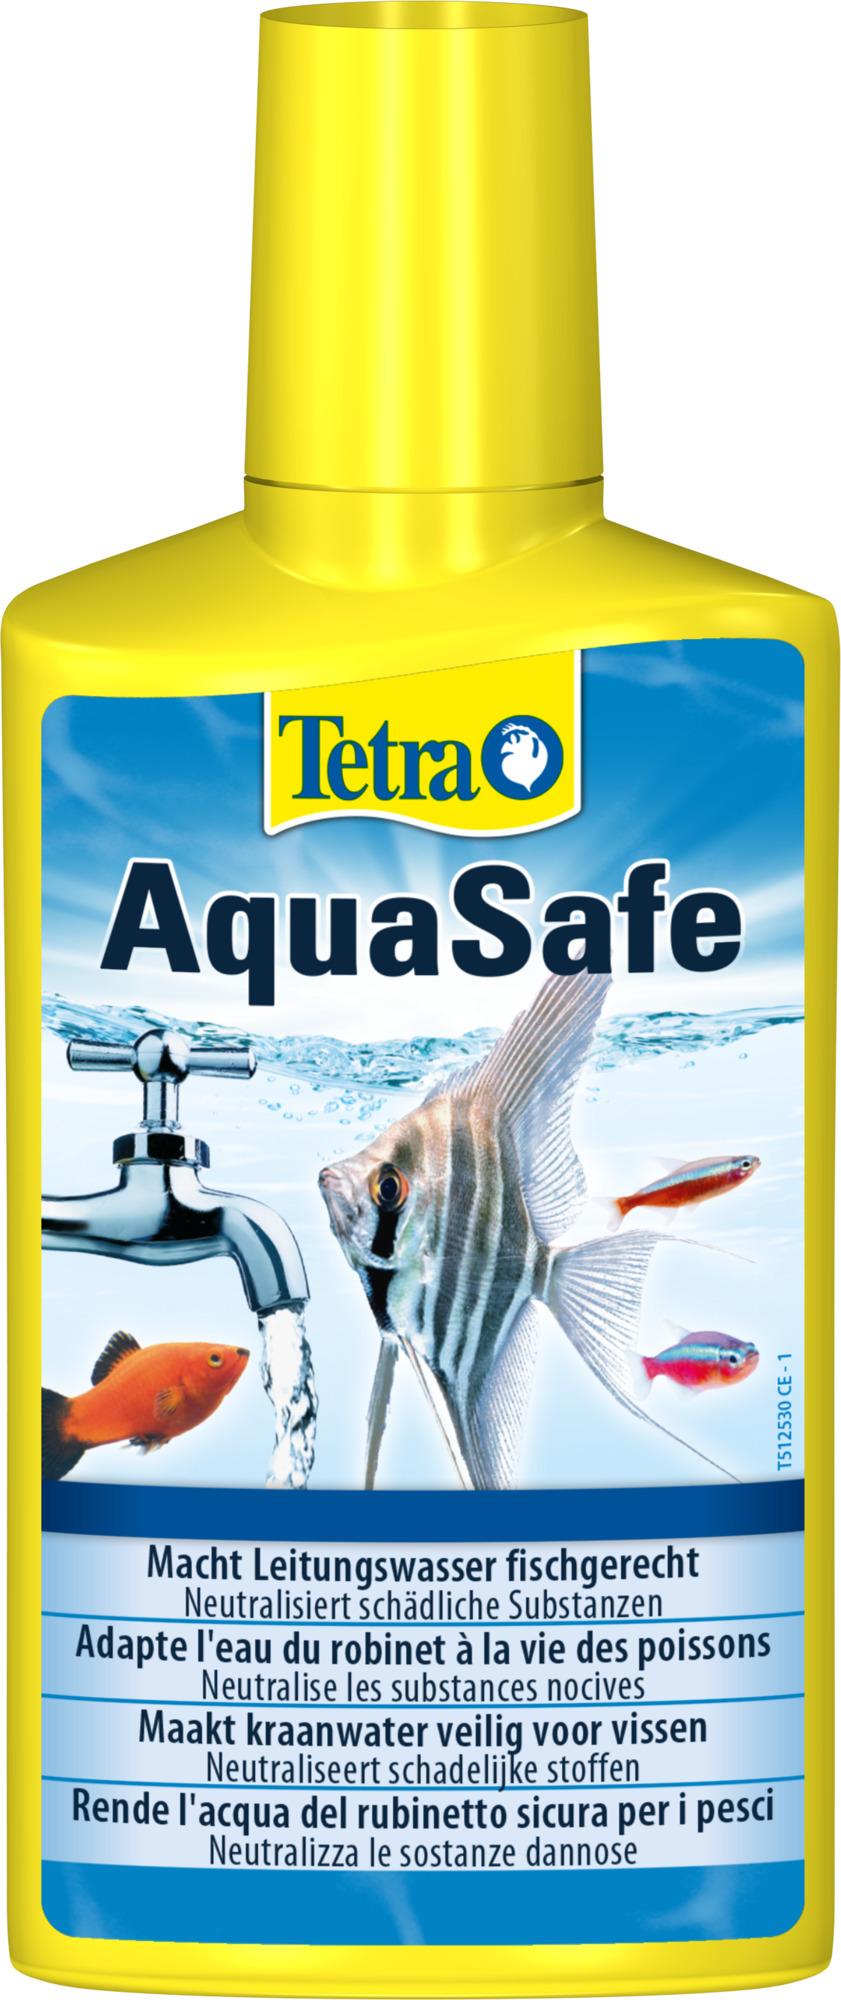 tetra-aquasafe-250-ml-conditionneur-eau-du-robinet-aquarium